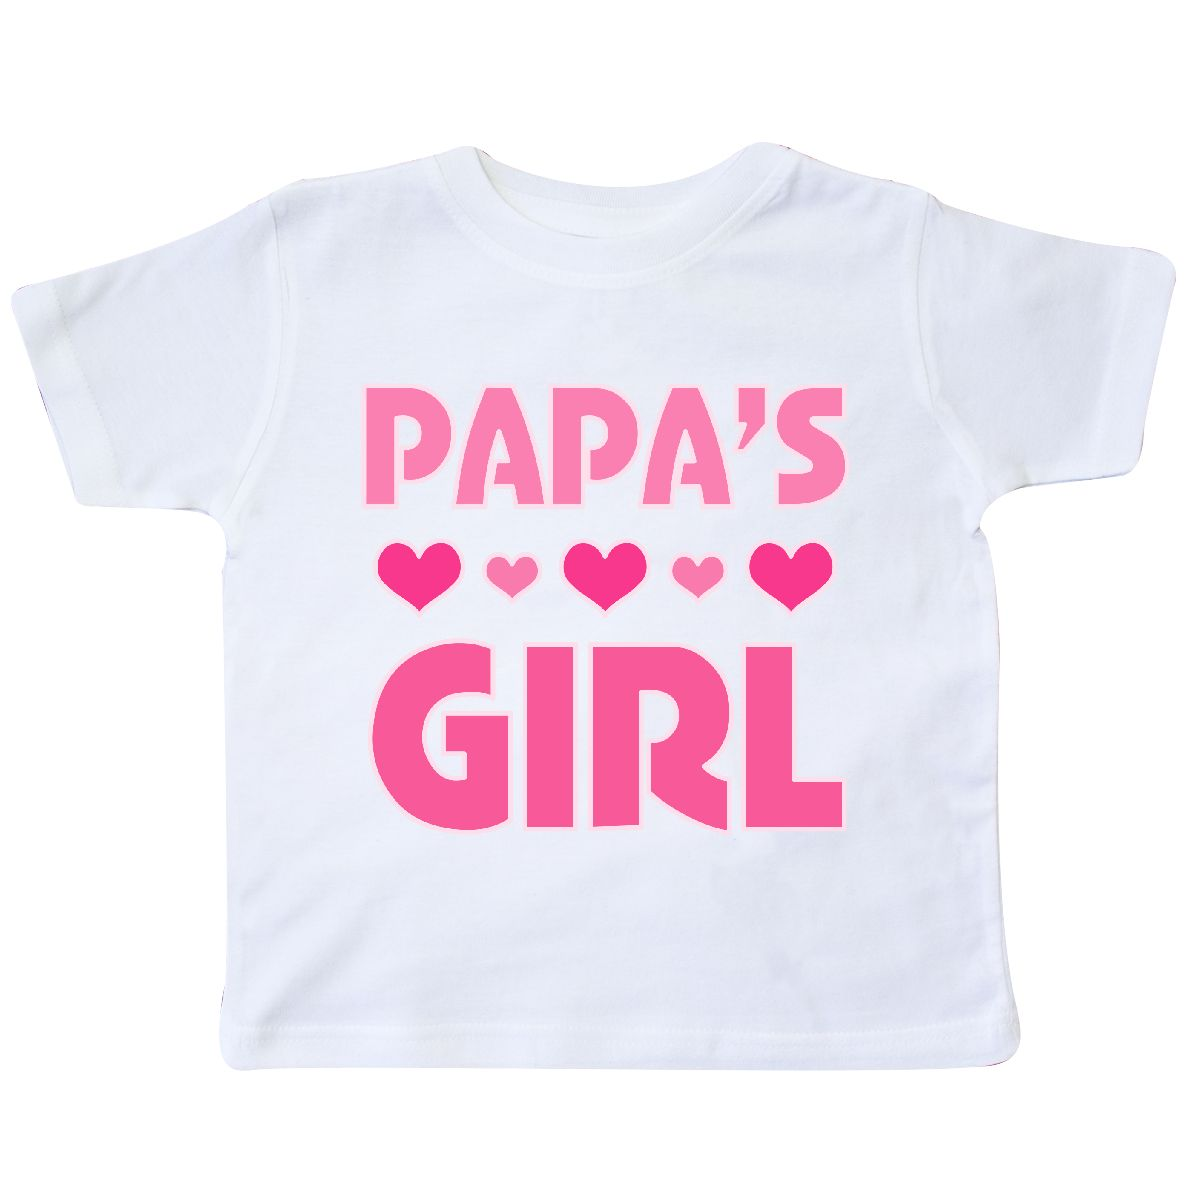 2-Pack Cotton Tee Puerto Rico Resiste Boricua Flag Se Levanta Baby Girls Short Sleeve Ruffles T-Shirt Tops